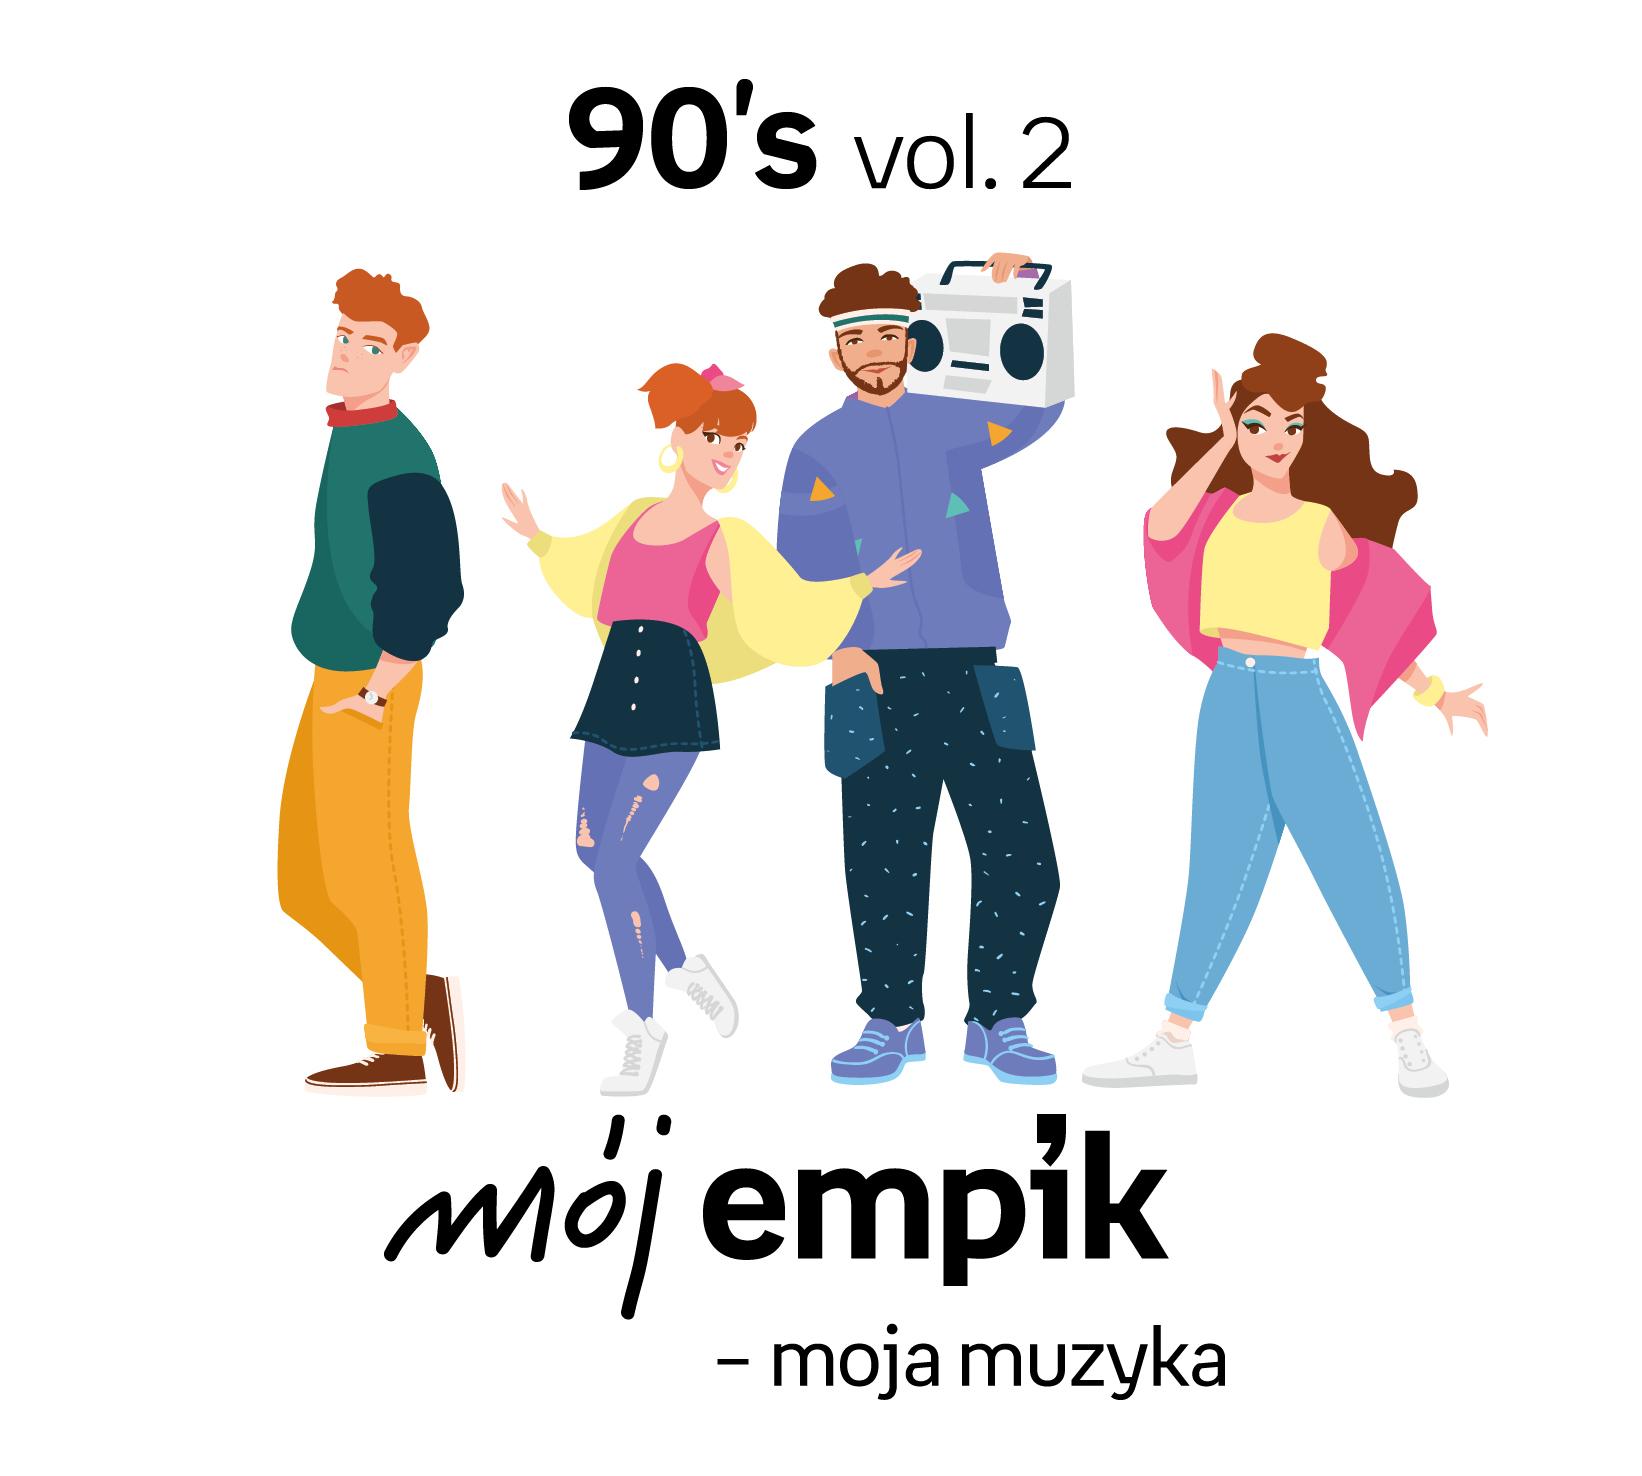 Mój Empik – Moja Muzyka. 90's vol. 2